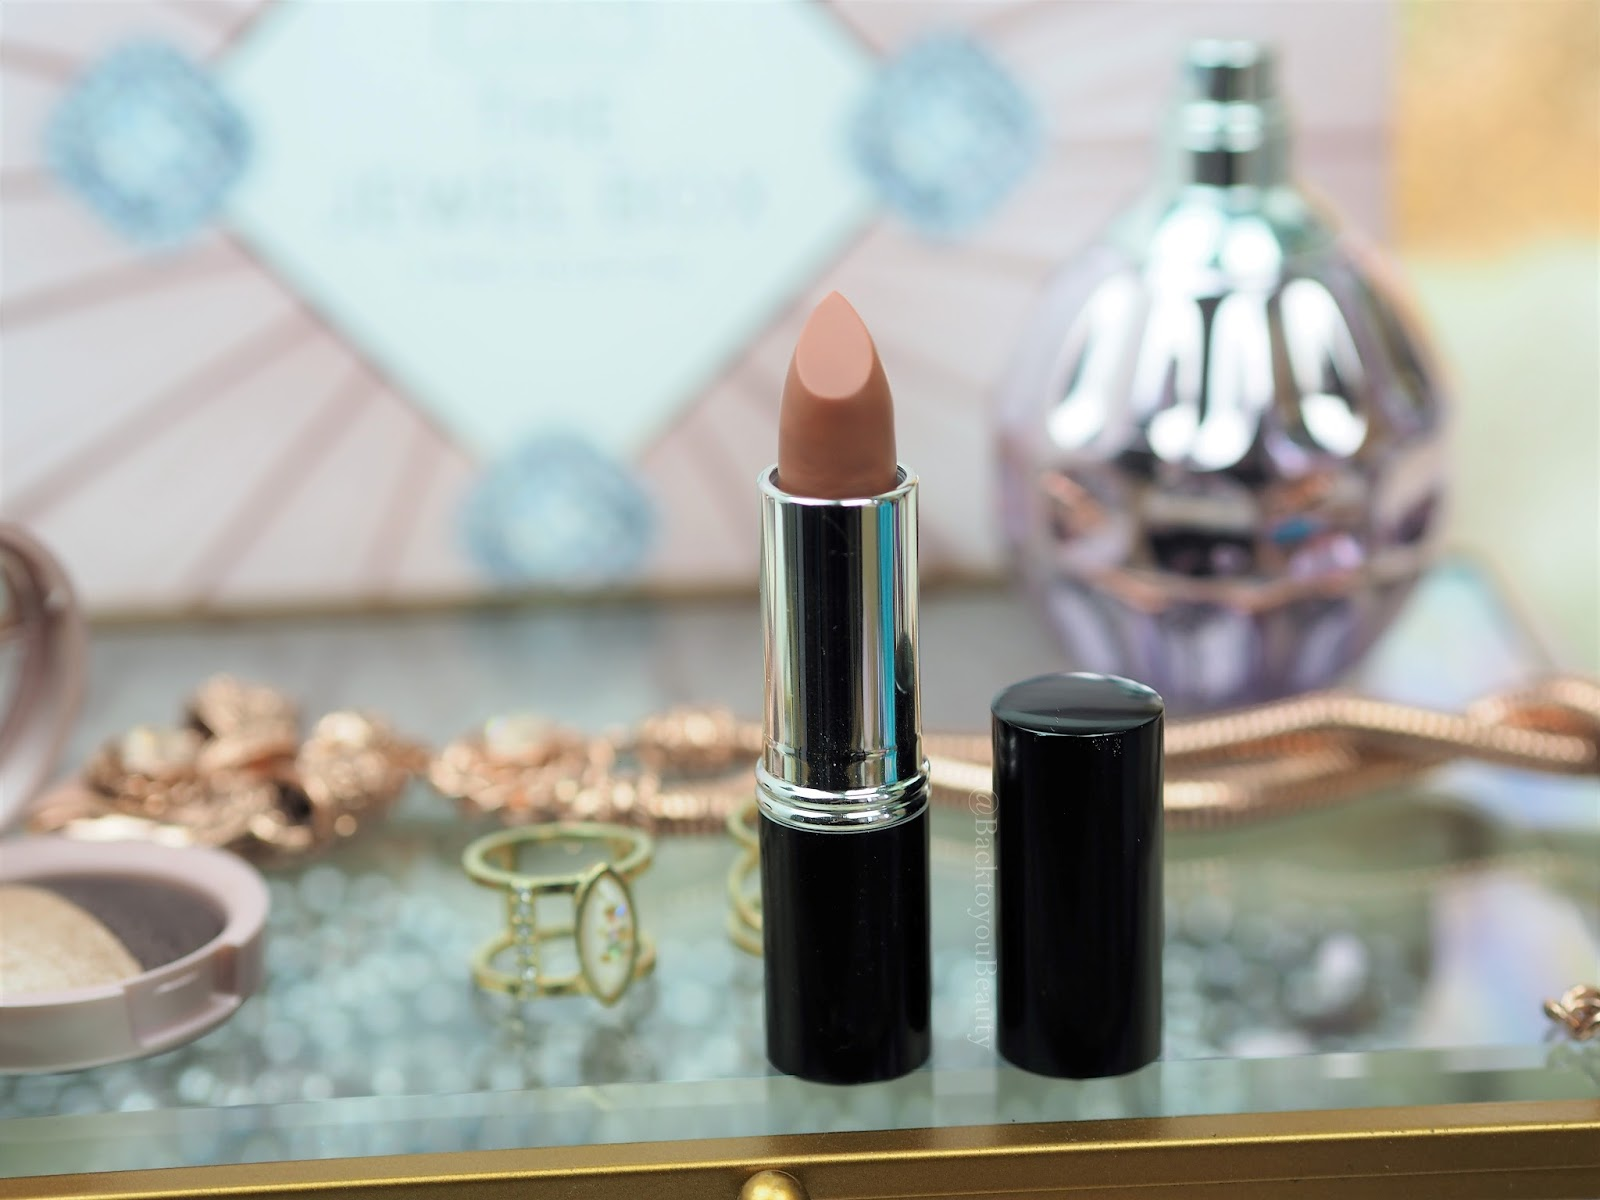 Laura Geller Italian Marble Lipstick in Vista